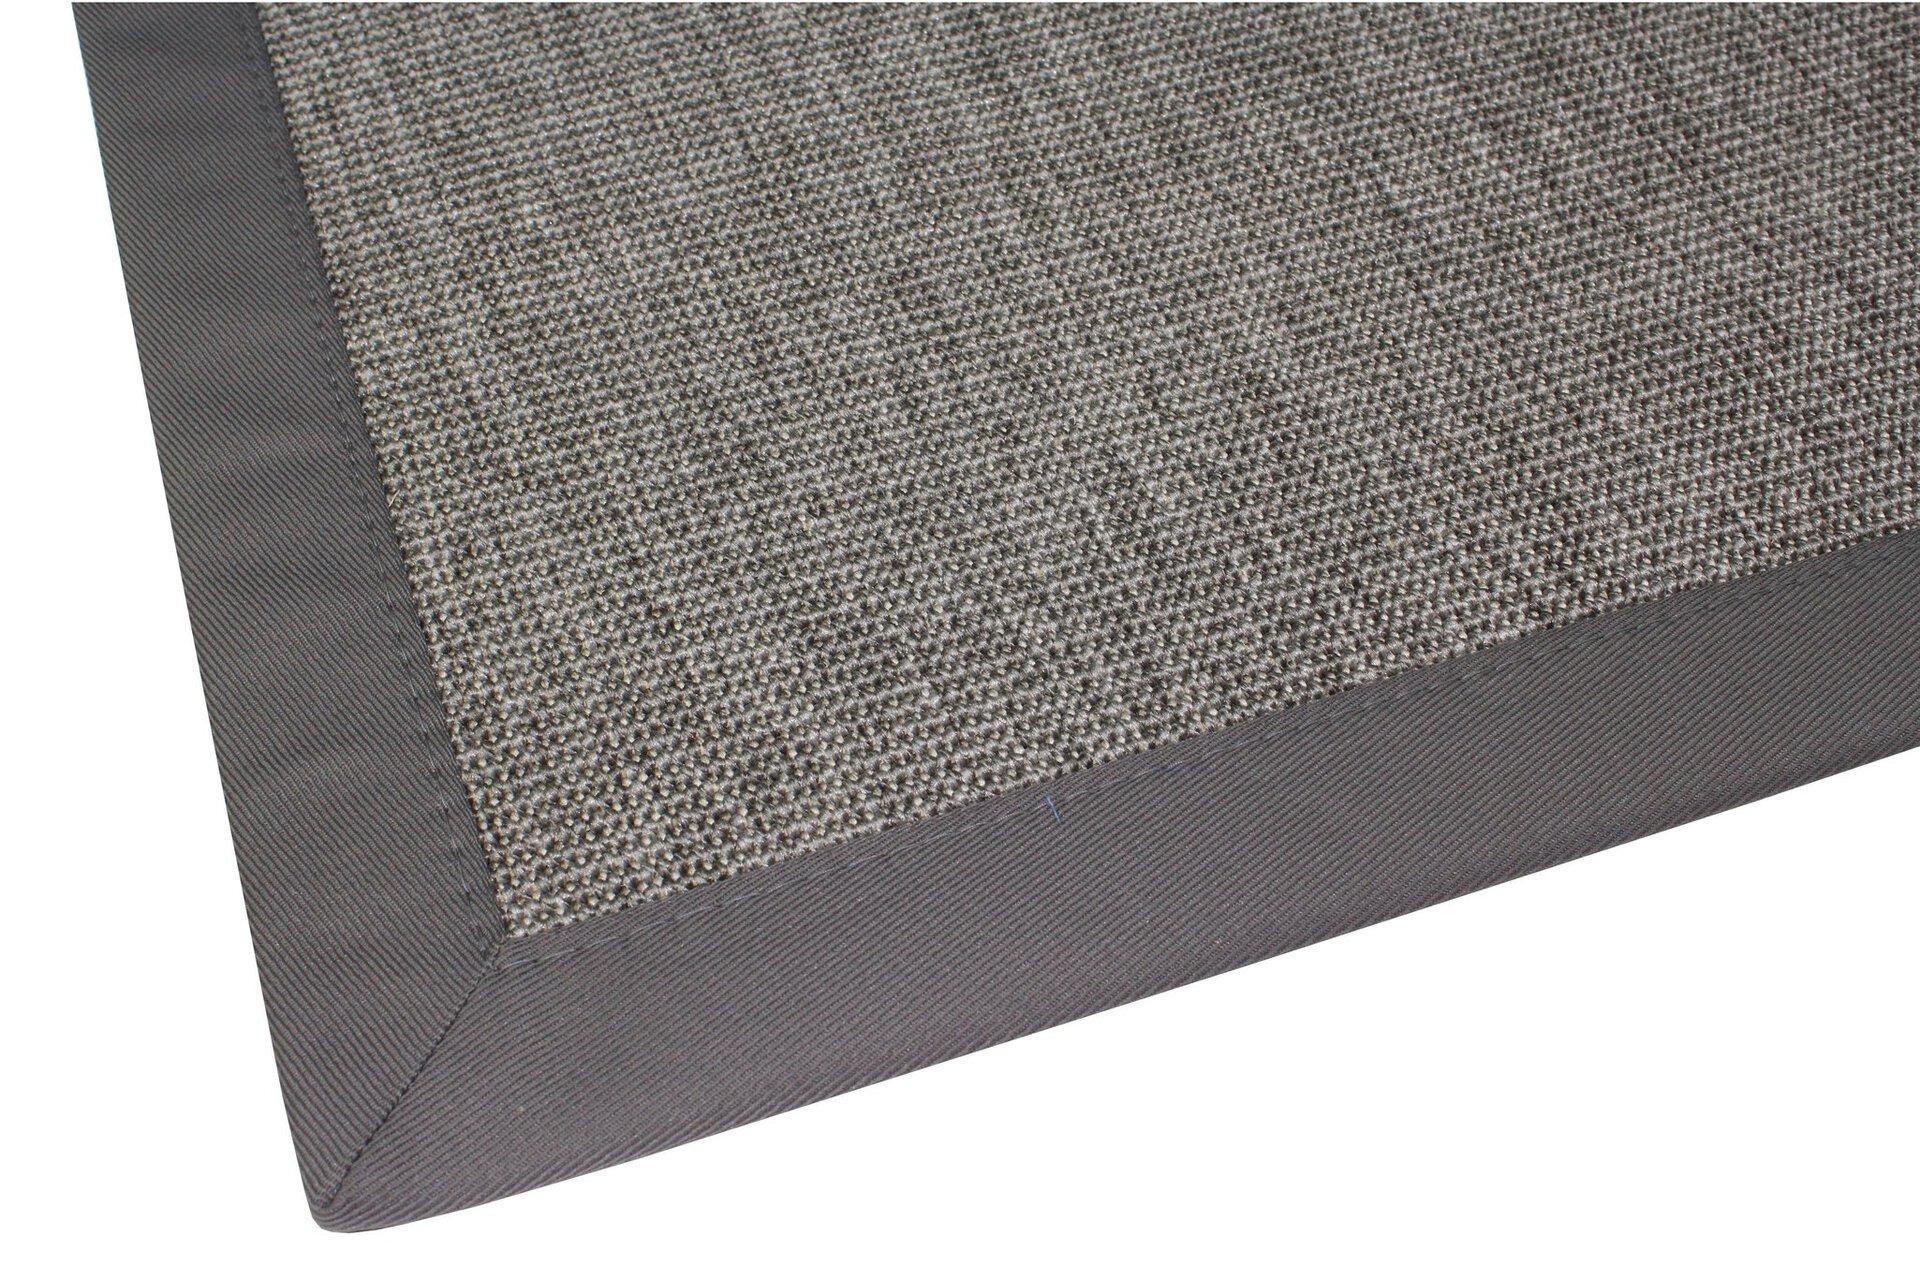 Outdoorteppich Naturino Rips DEKOWE Textil grau